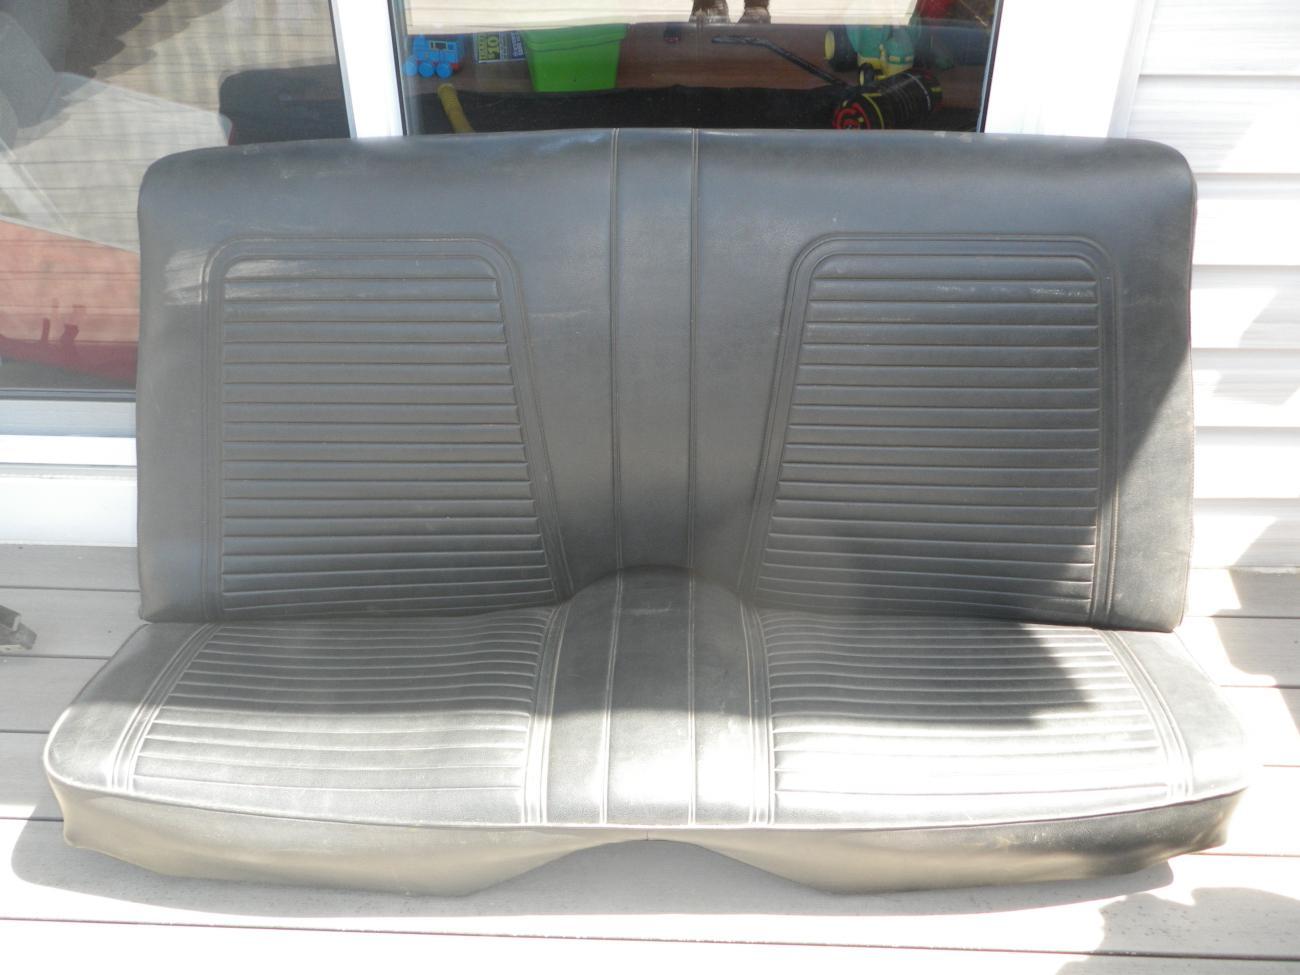 Rear Seat For 1969 Camaro Black And White Camaro5 Chevy